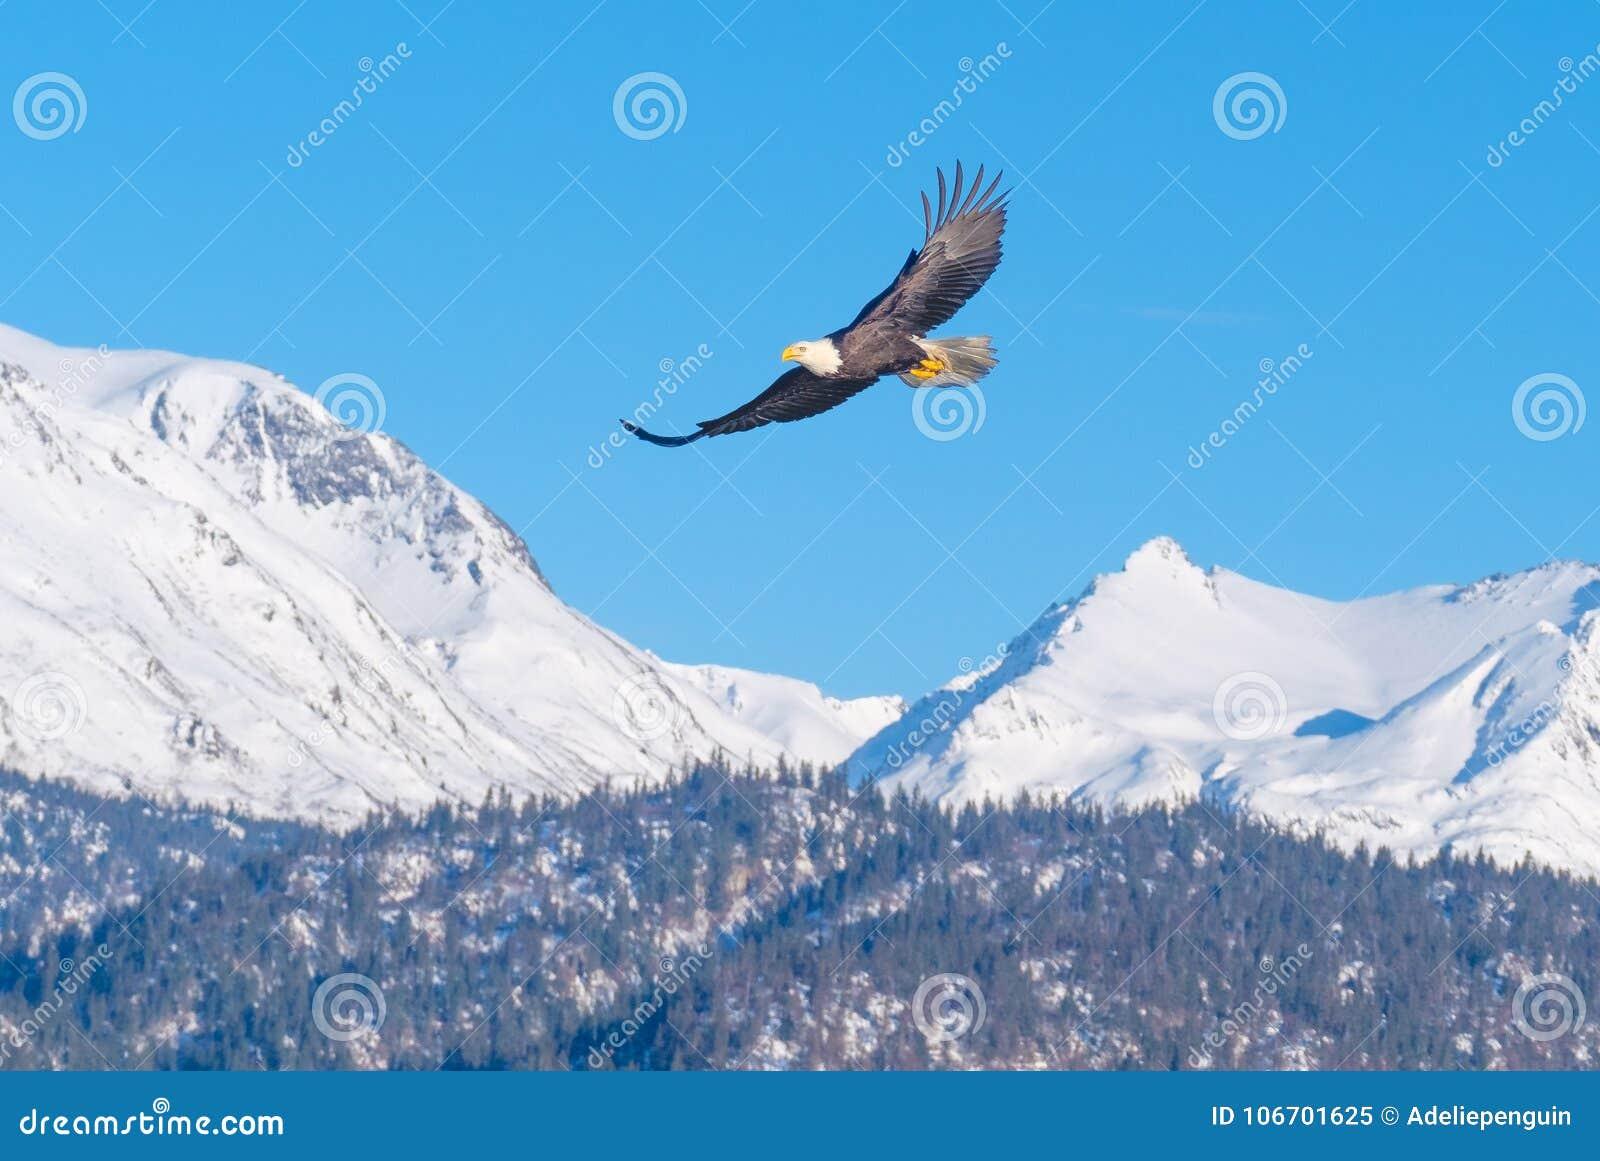 Bald Eagle, Snow-Capped Mountains, Alaska